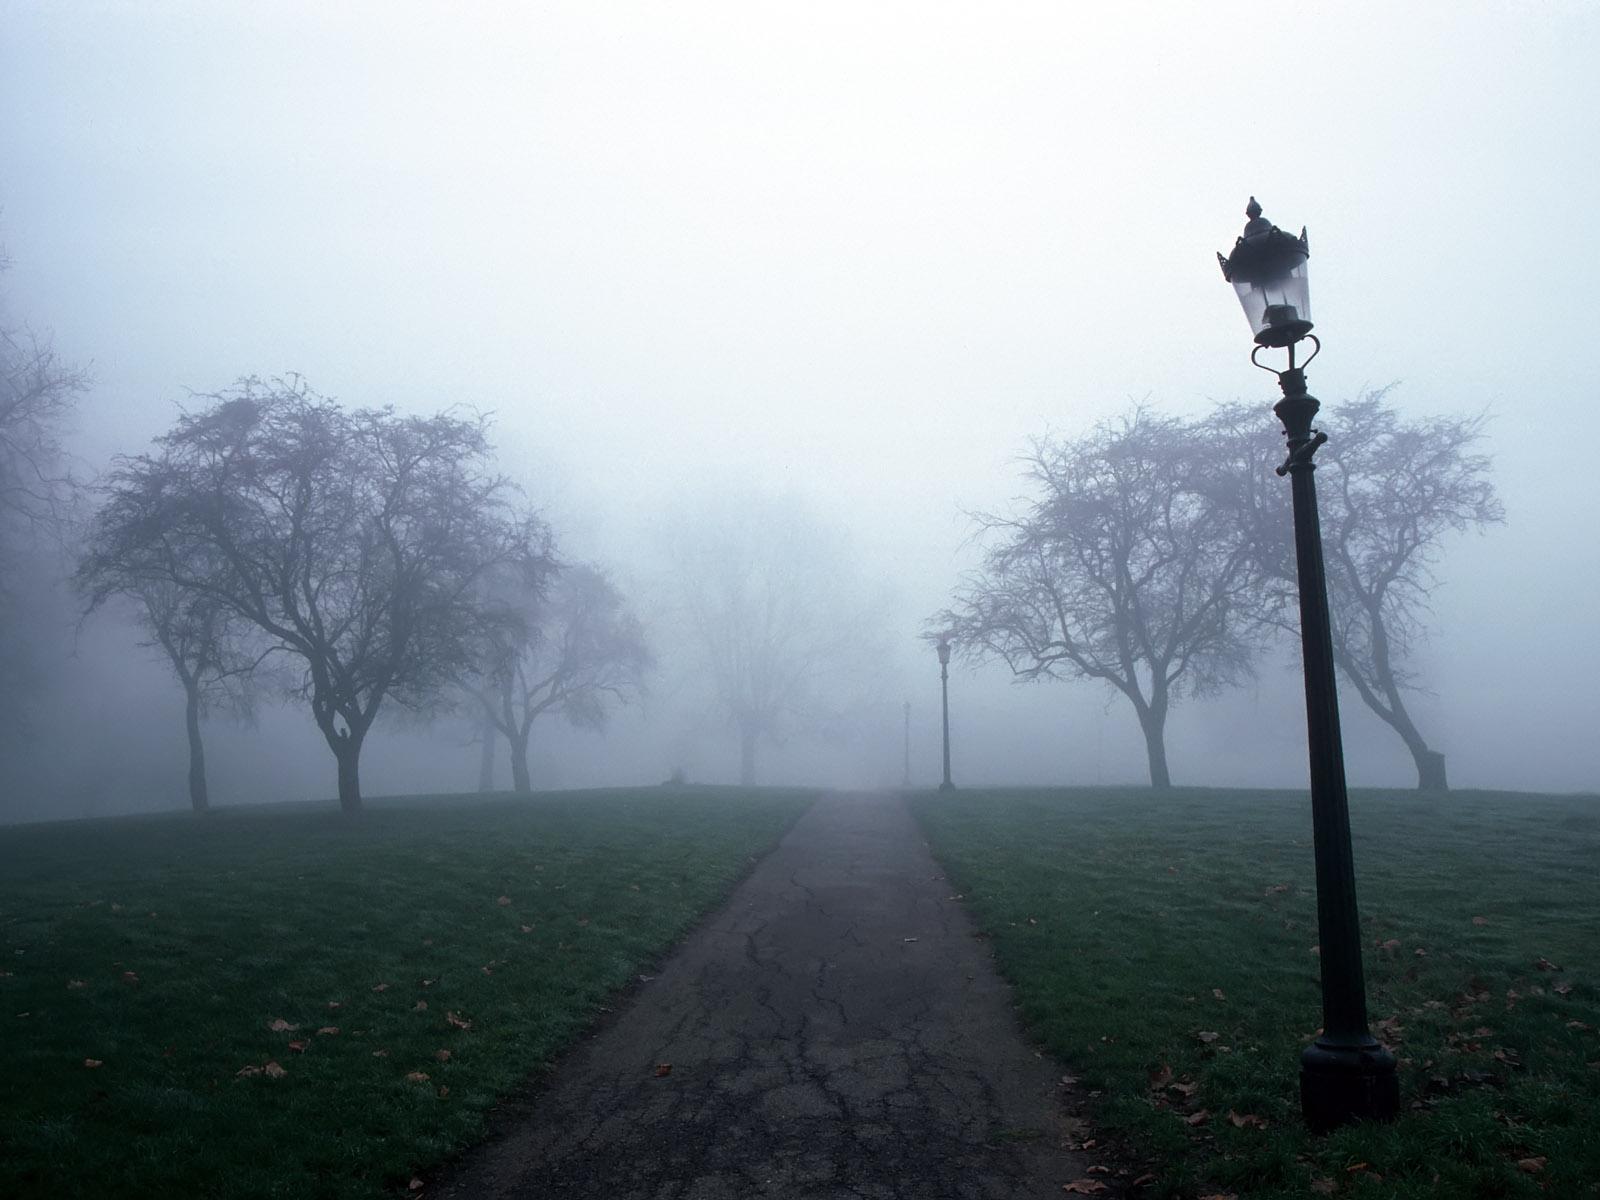 Fog clipart. Cilpart sumptuous design roads